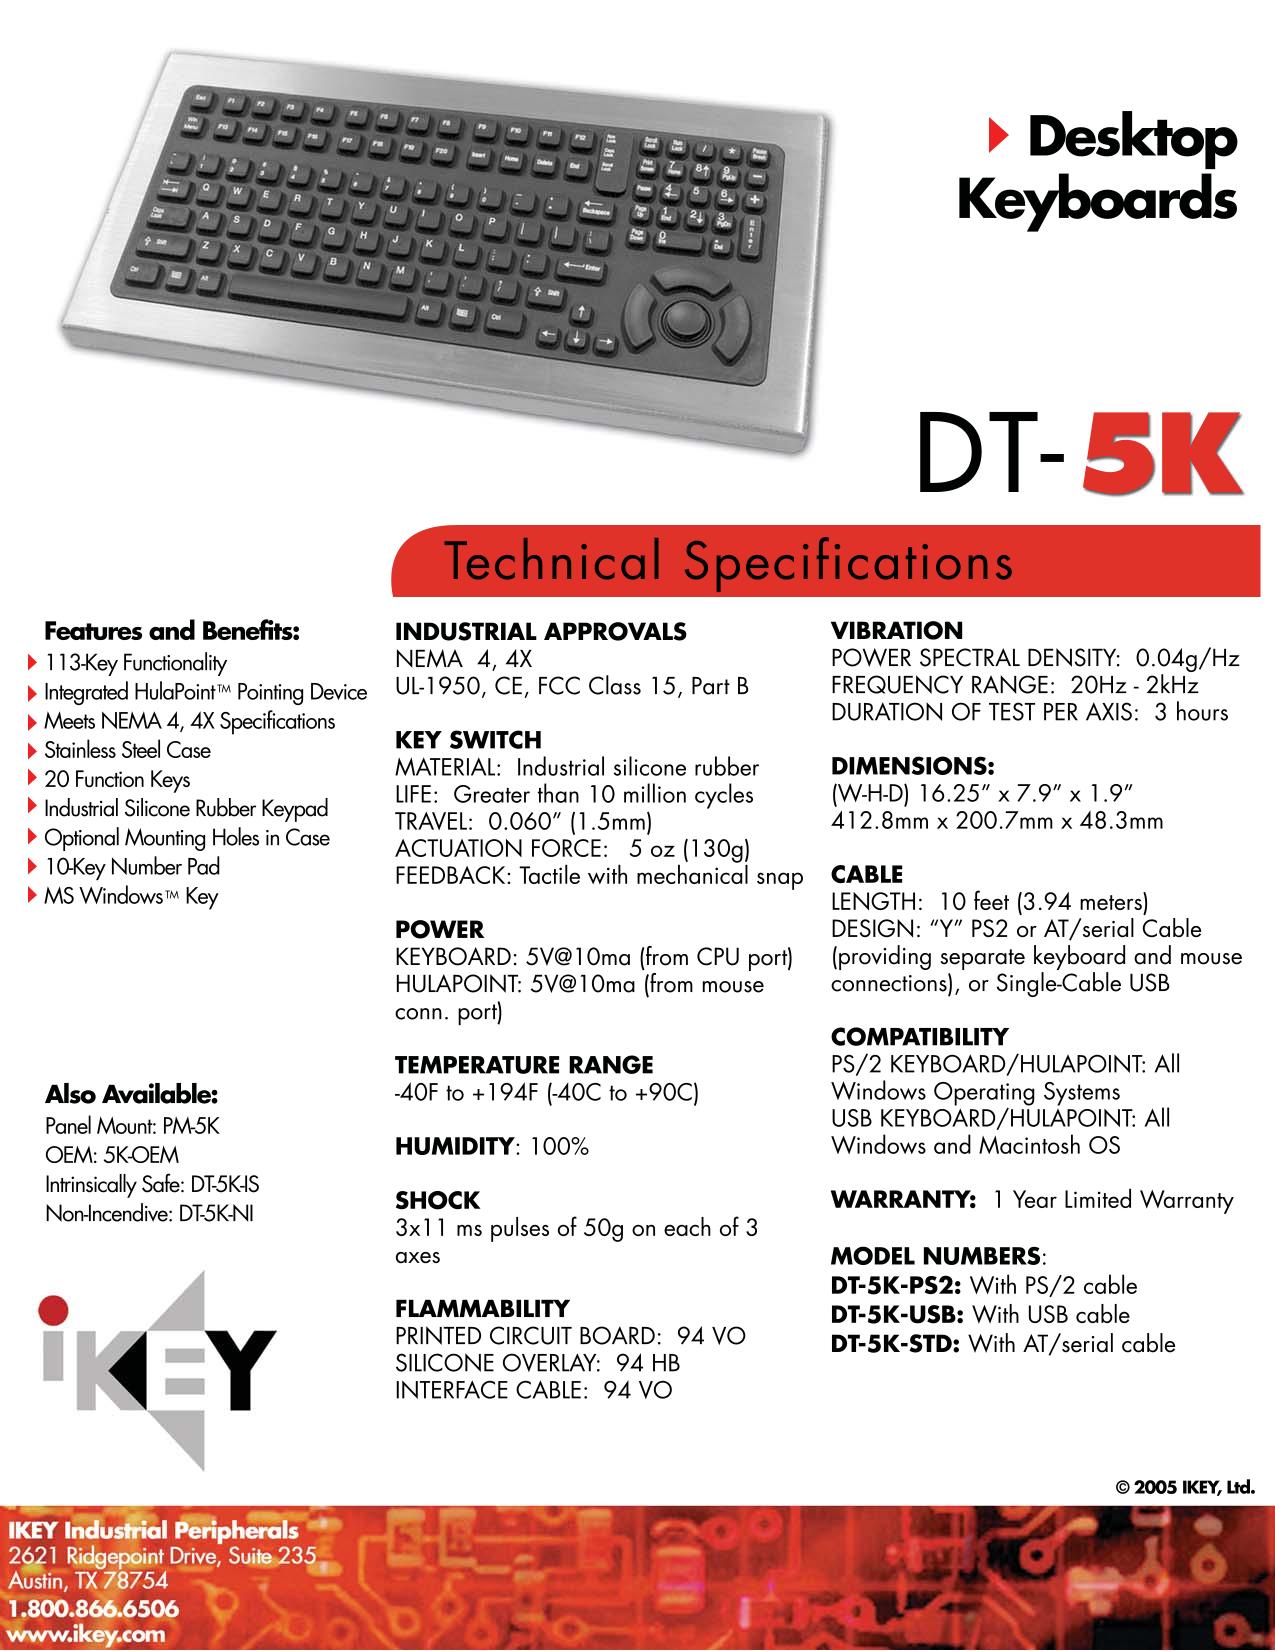 pdf for iKey Keyboard DT-5K manual